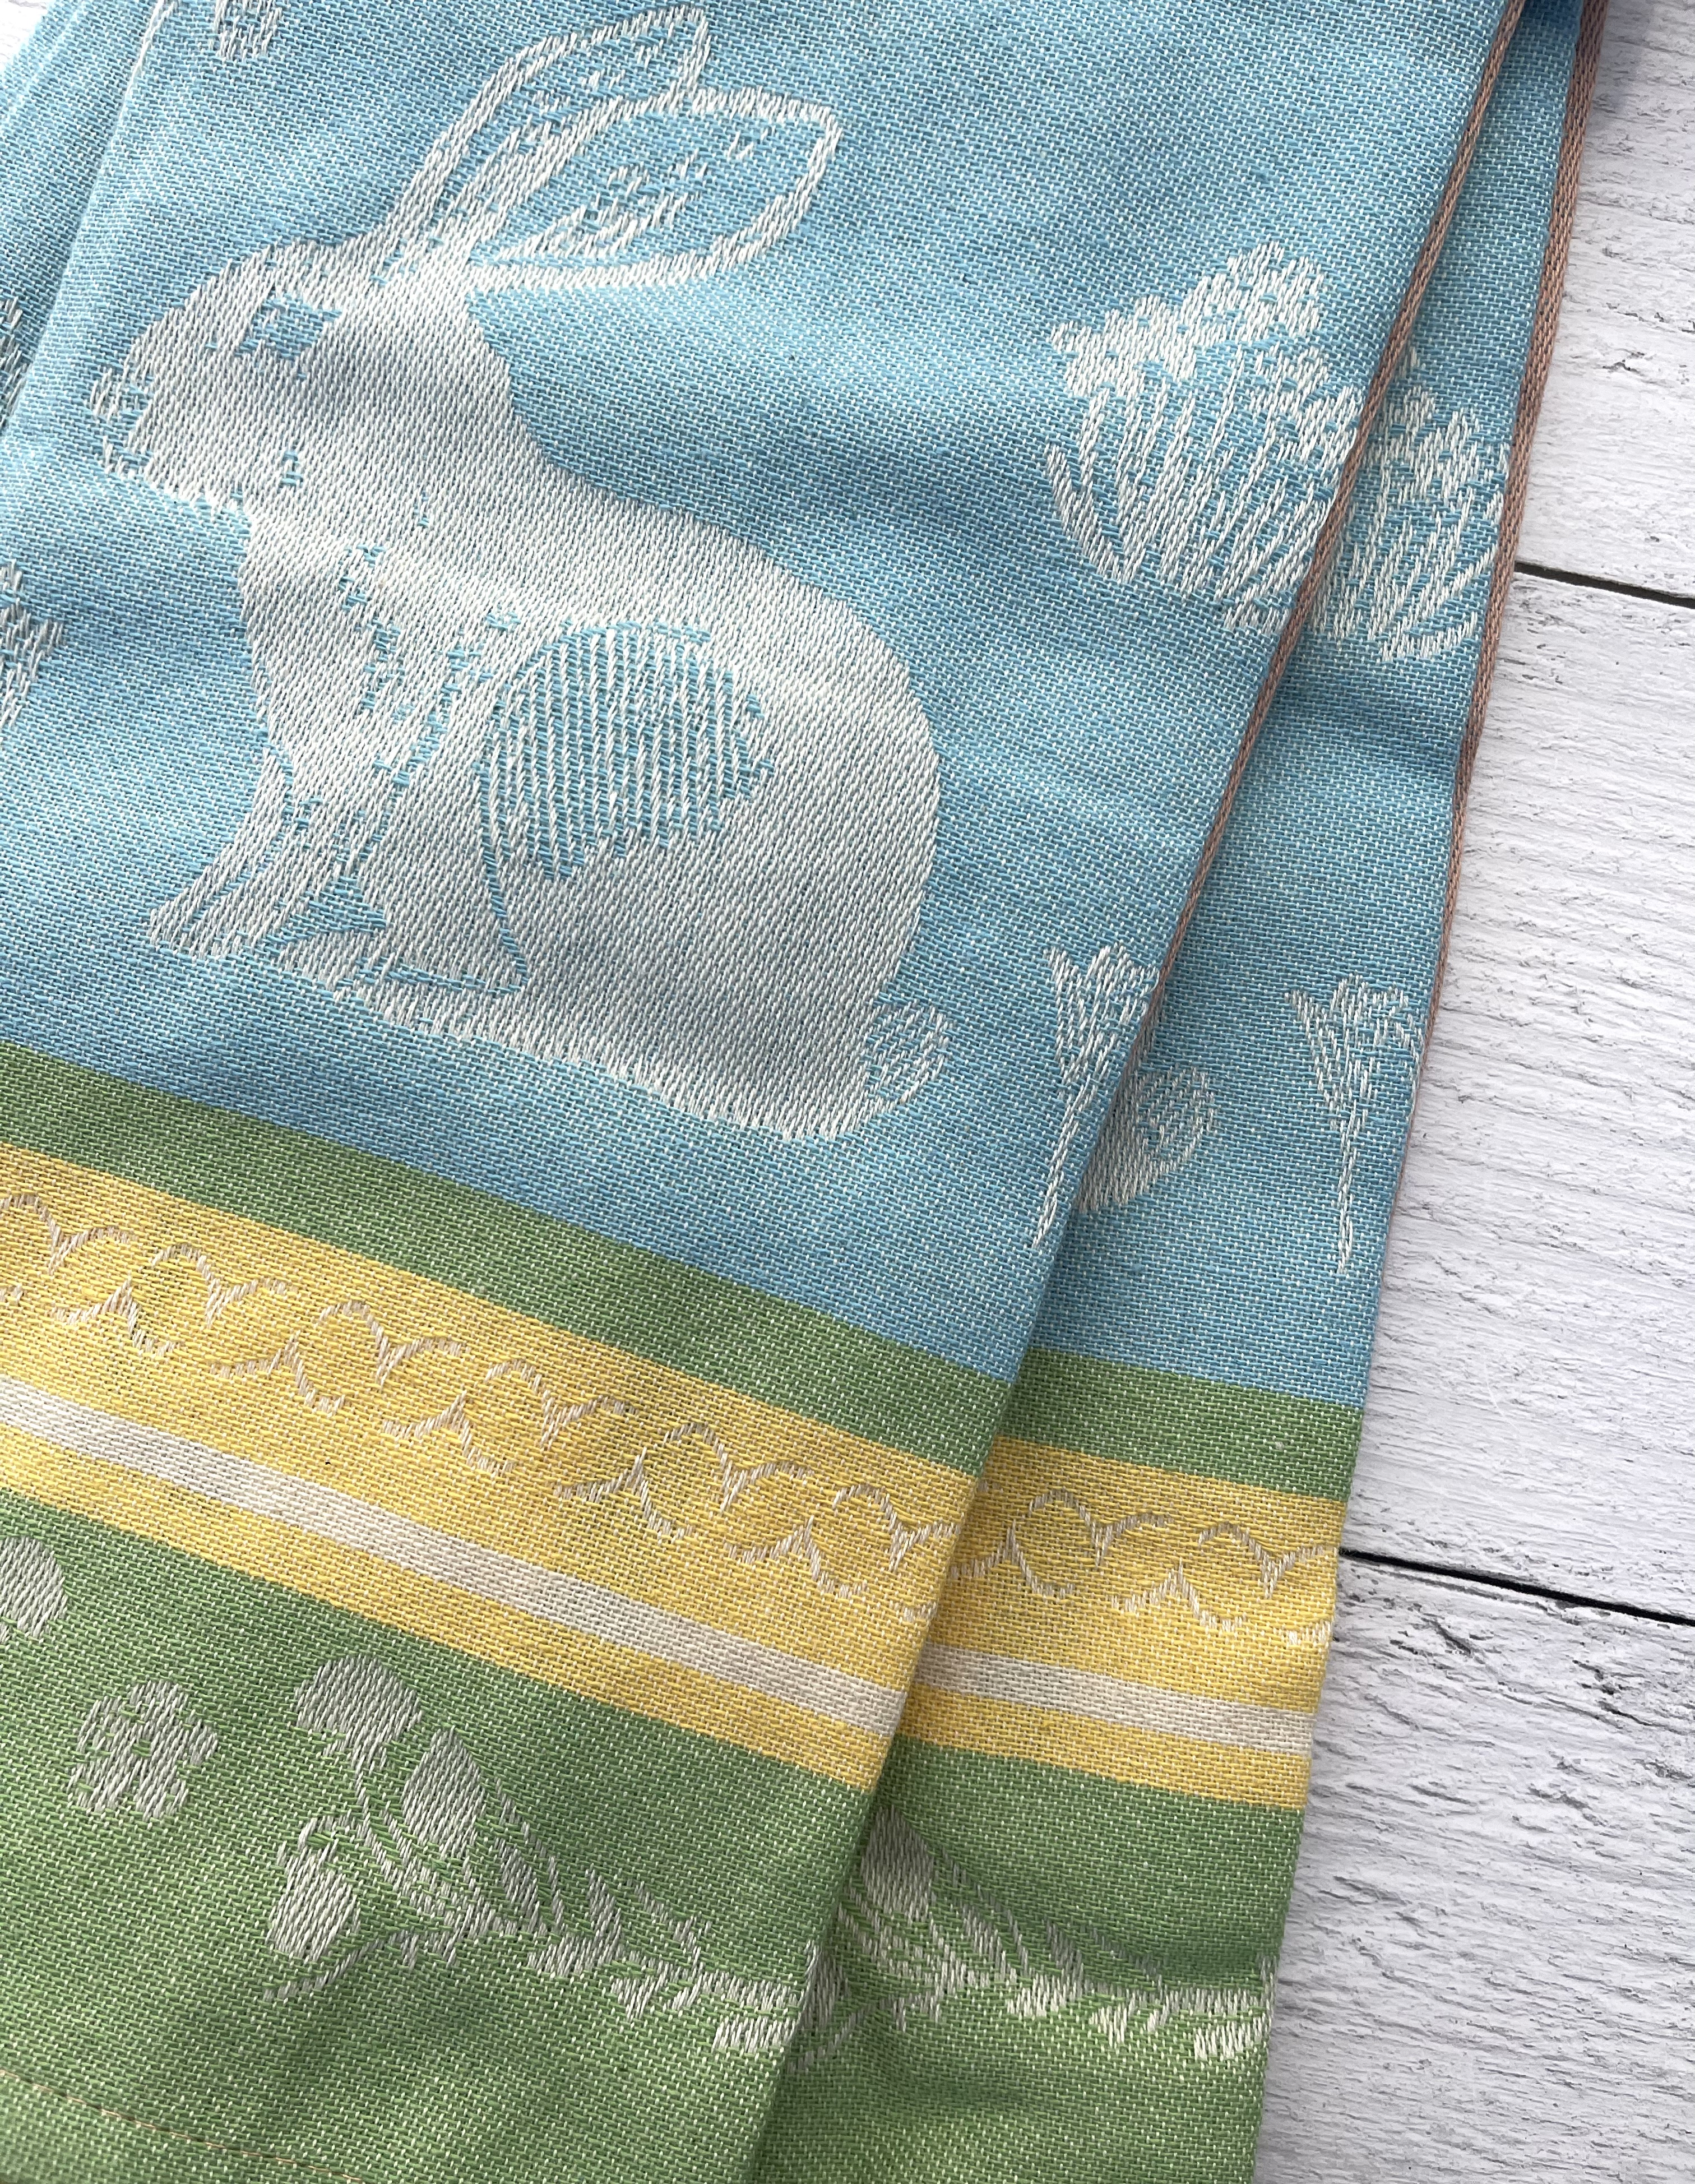 Spring Bunny, Jacquard Tea Towel